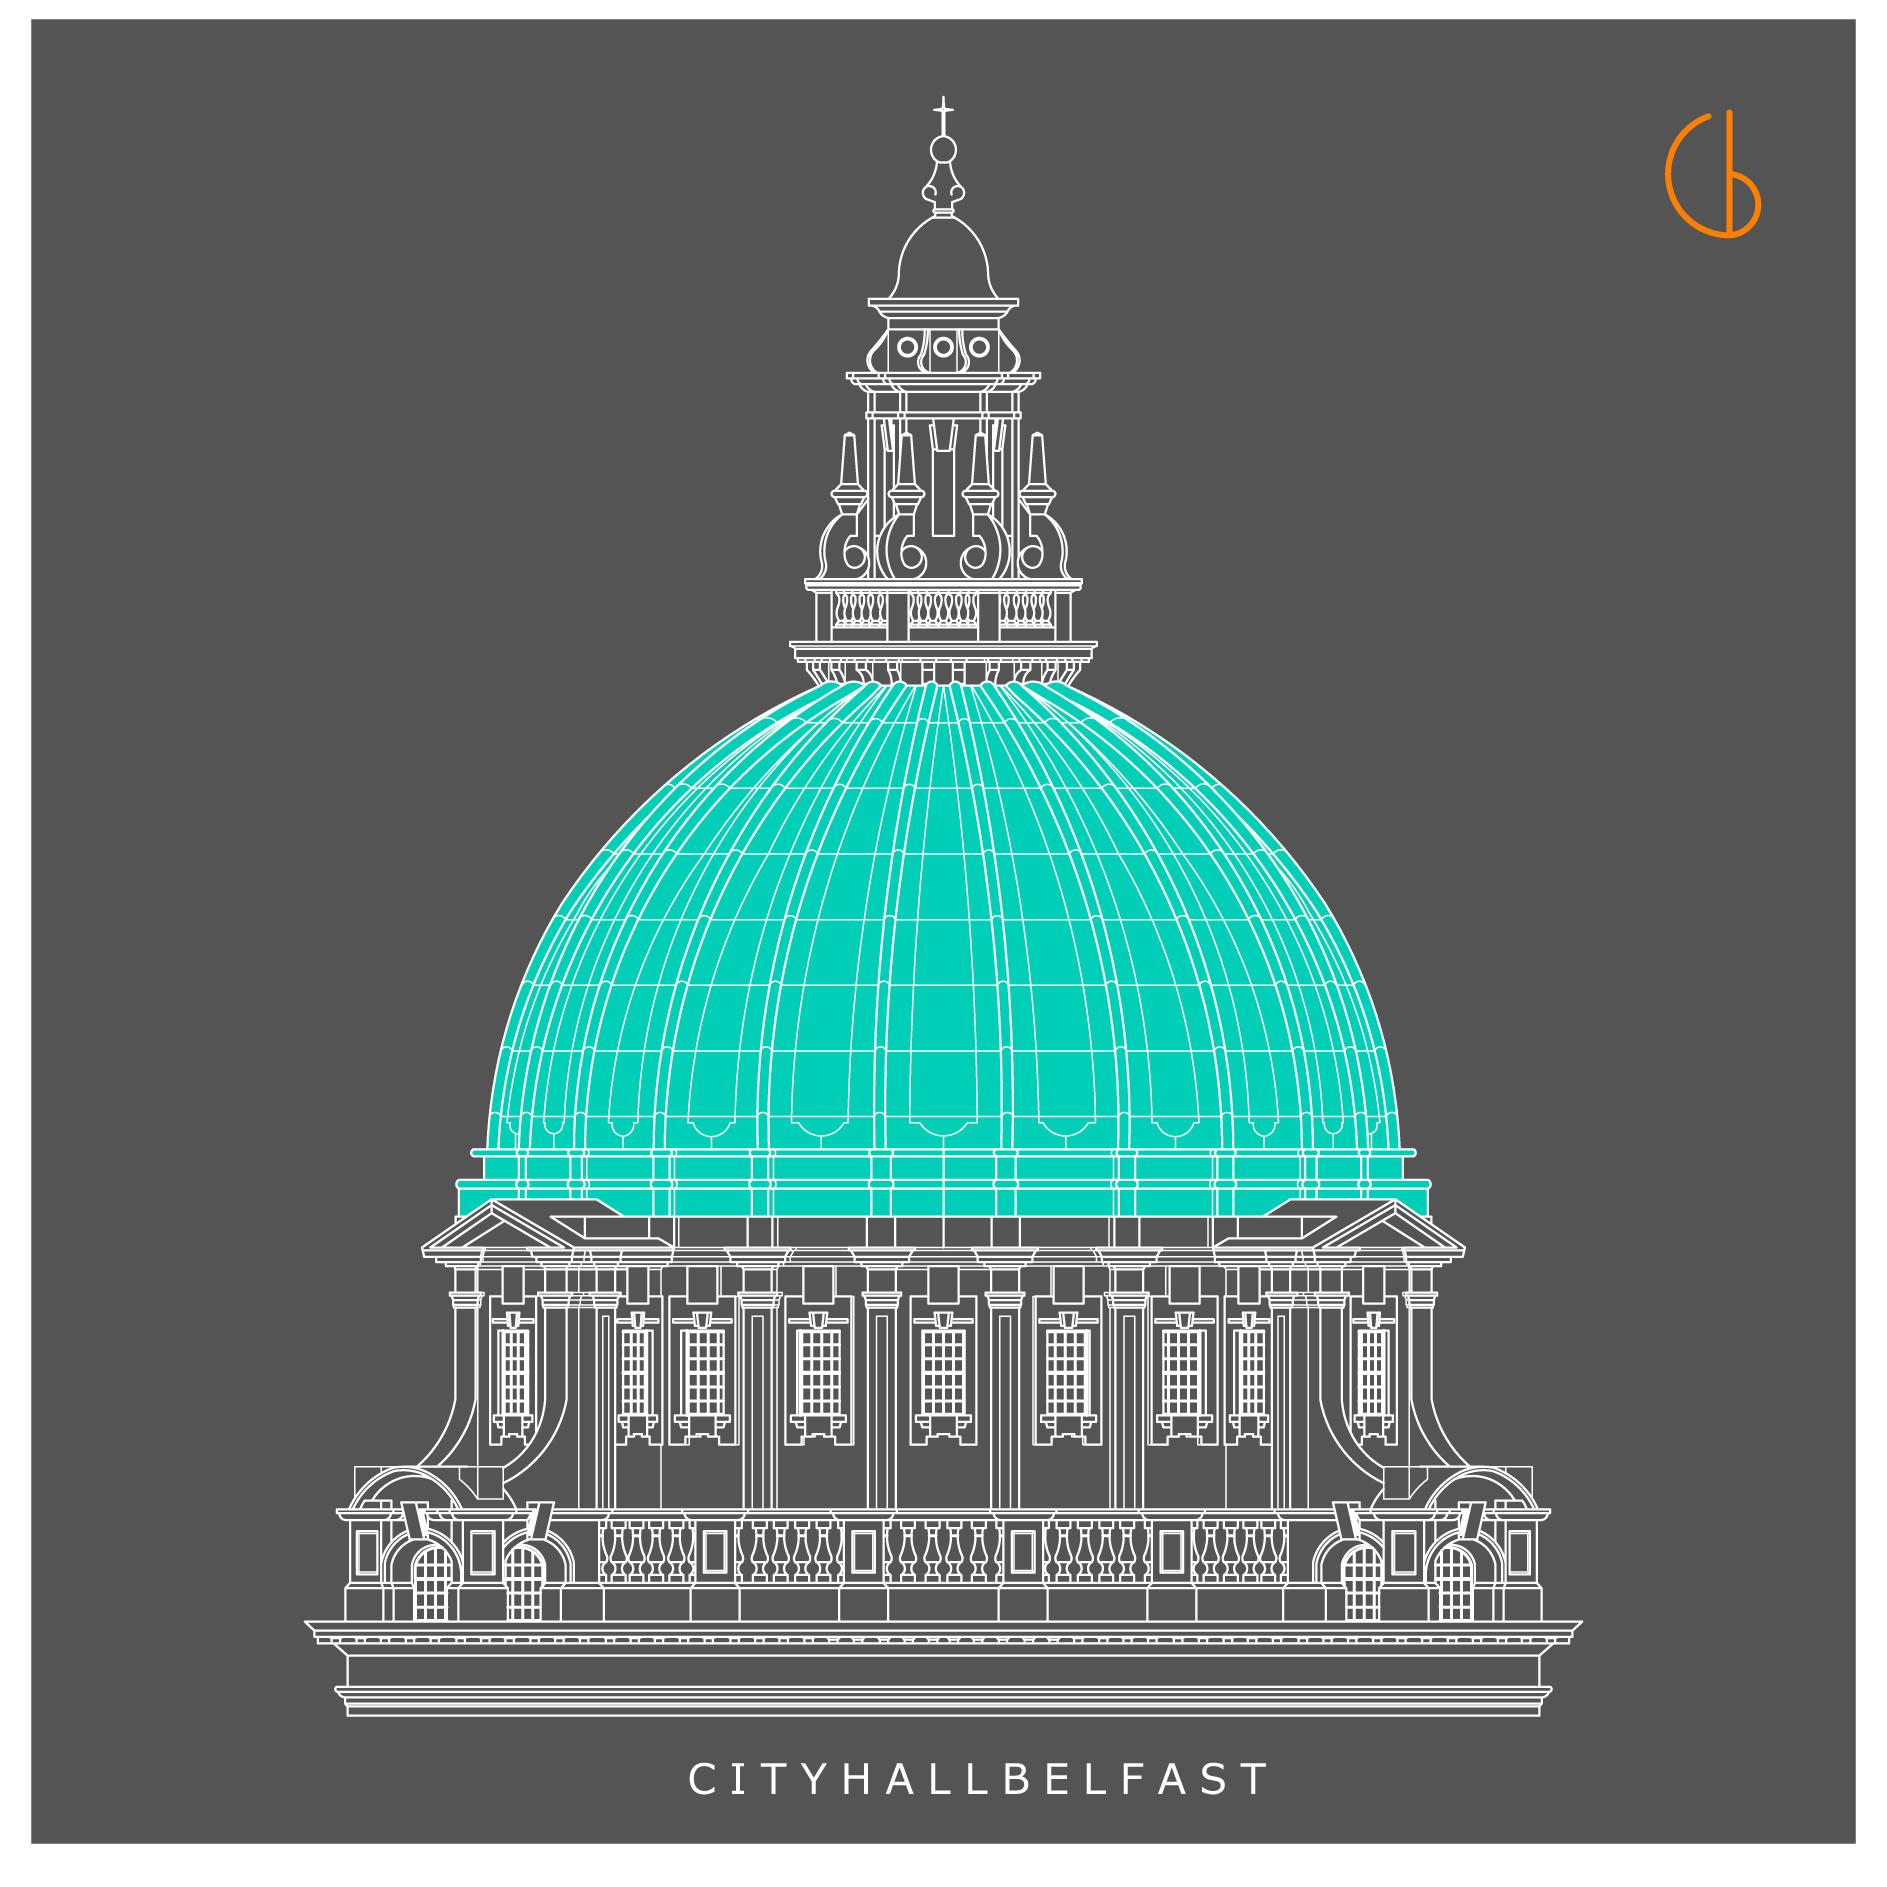 CITY HALL 230x230.jpg